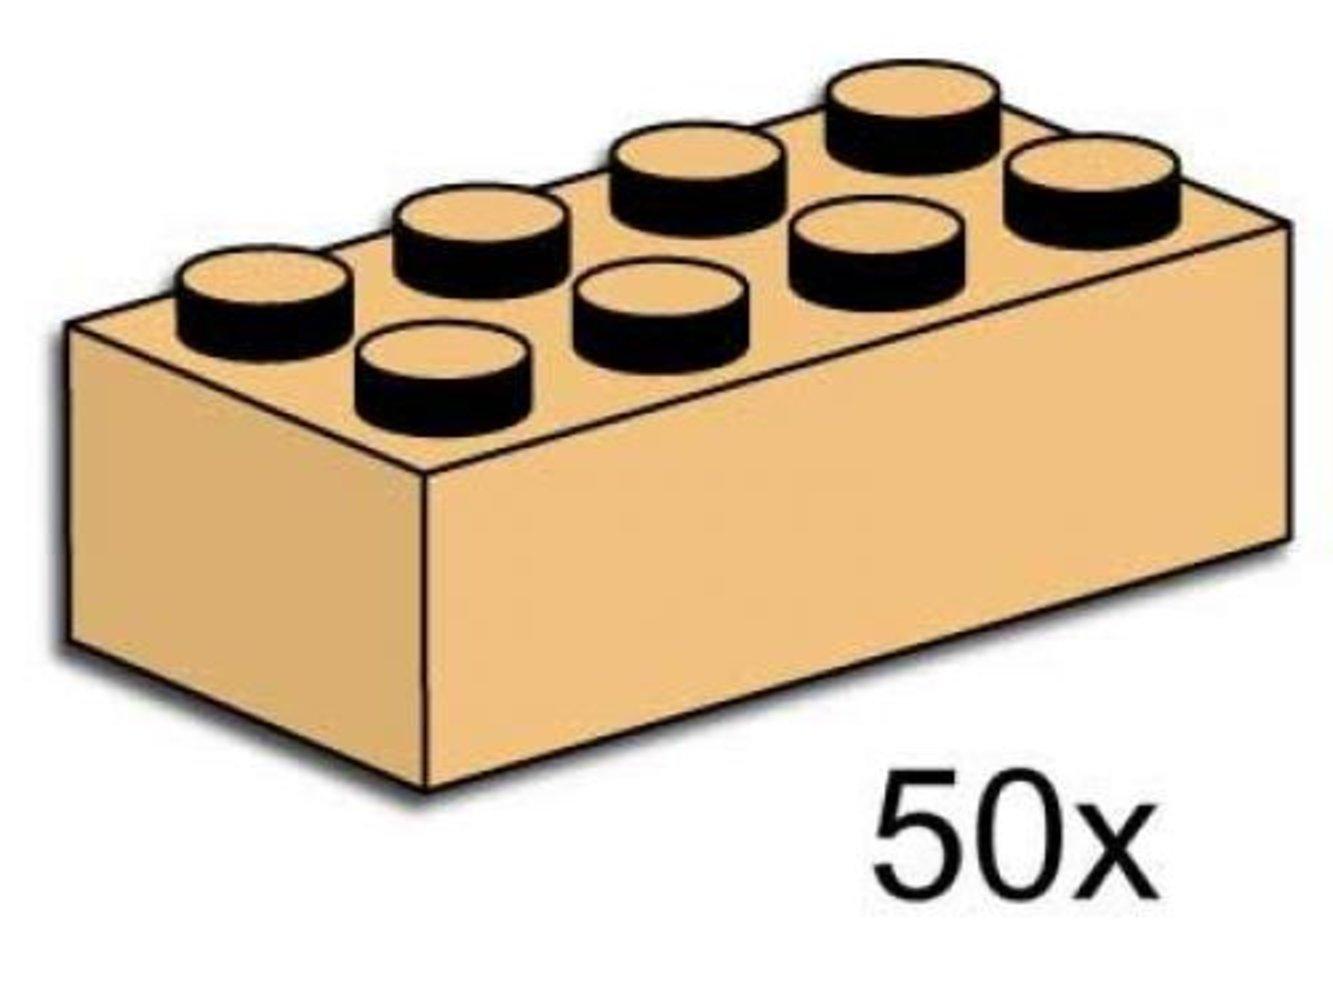 2 x 4 Tan Bricks